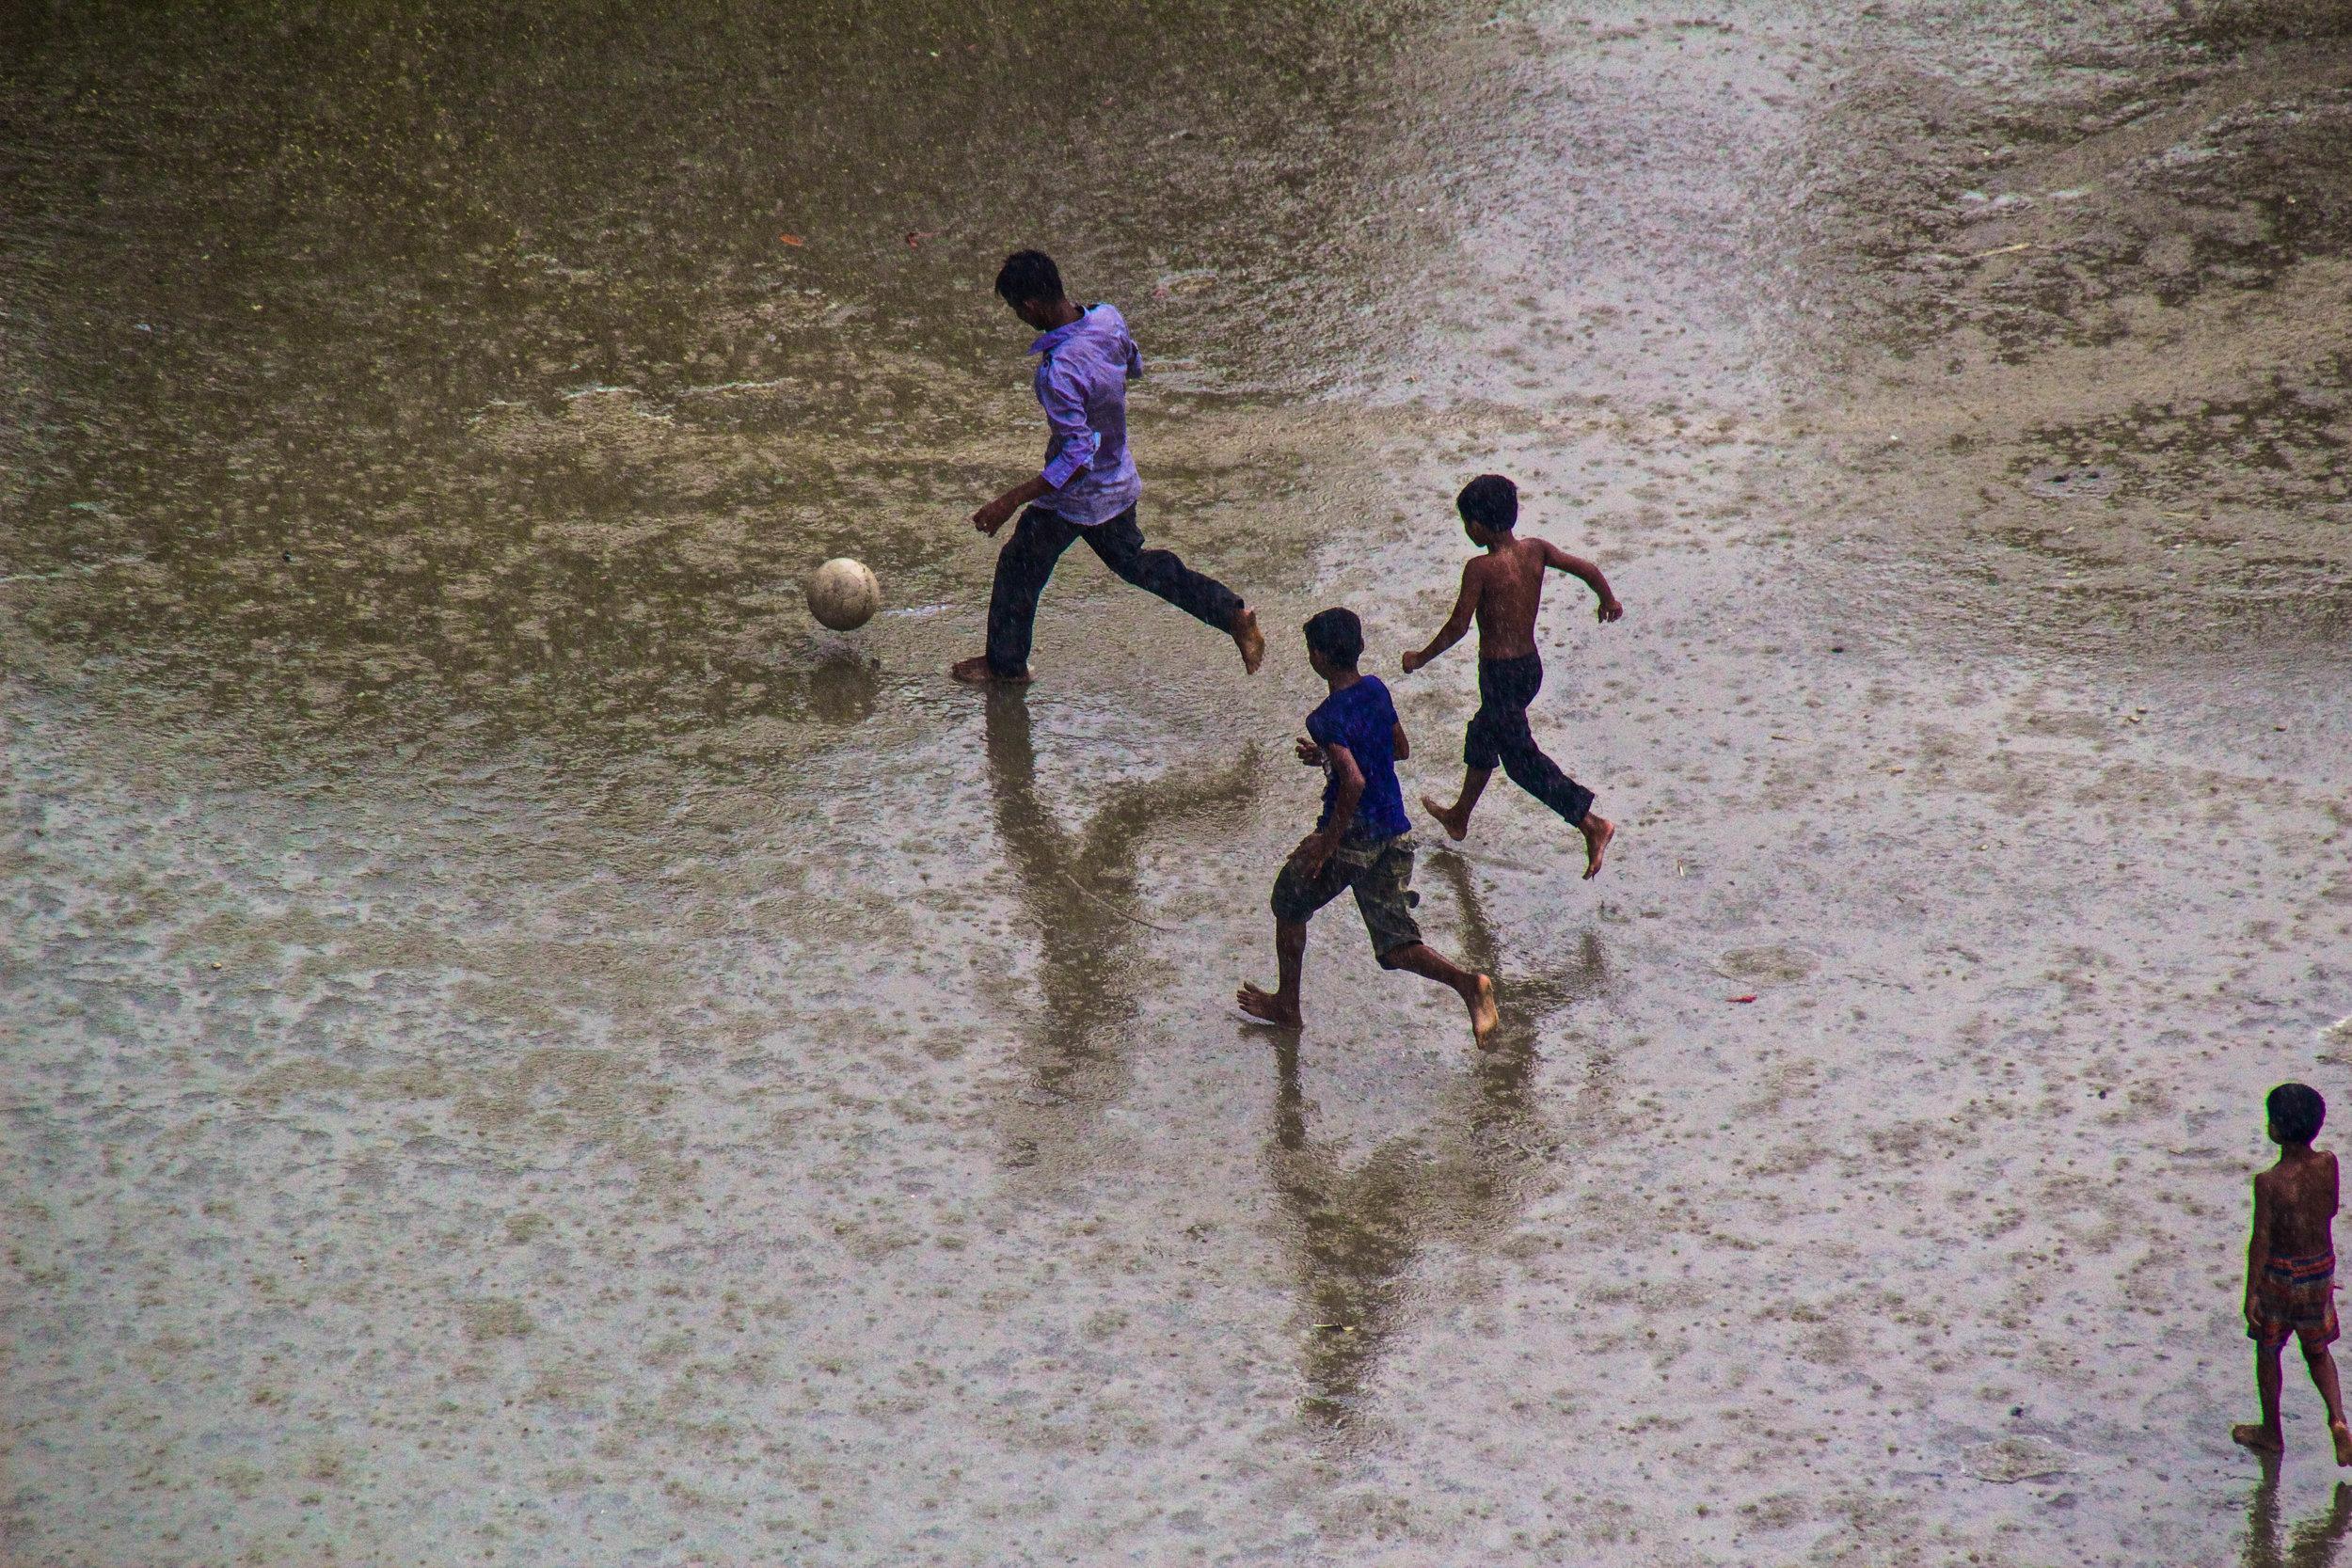 dhaka bangladesh slums soccer monsoon rain 7-2.jpg